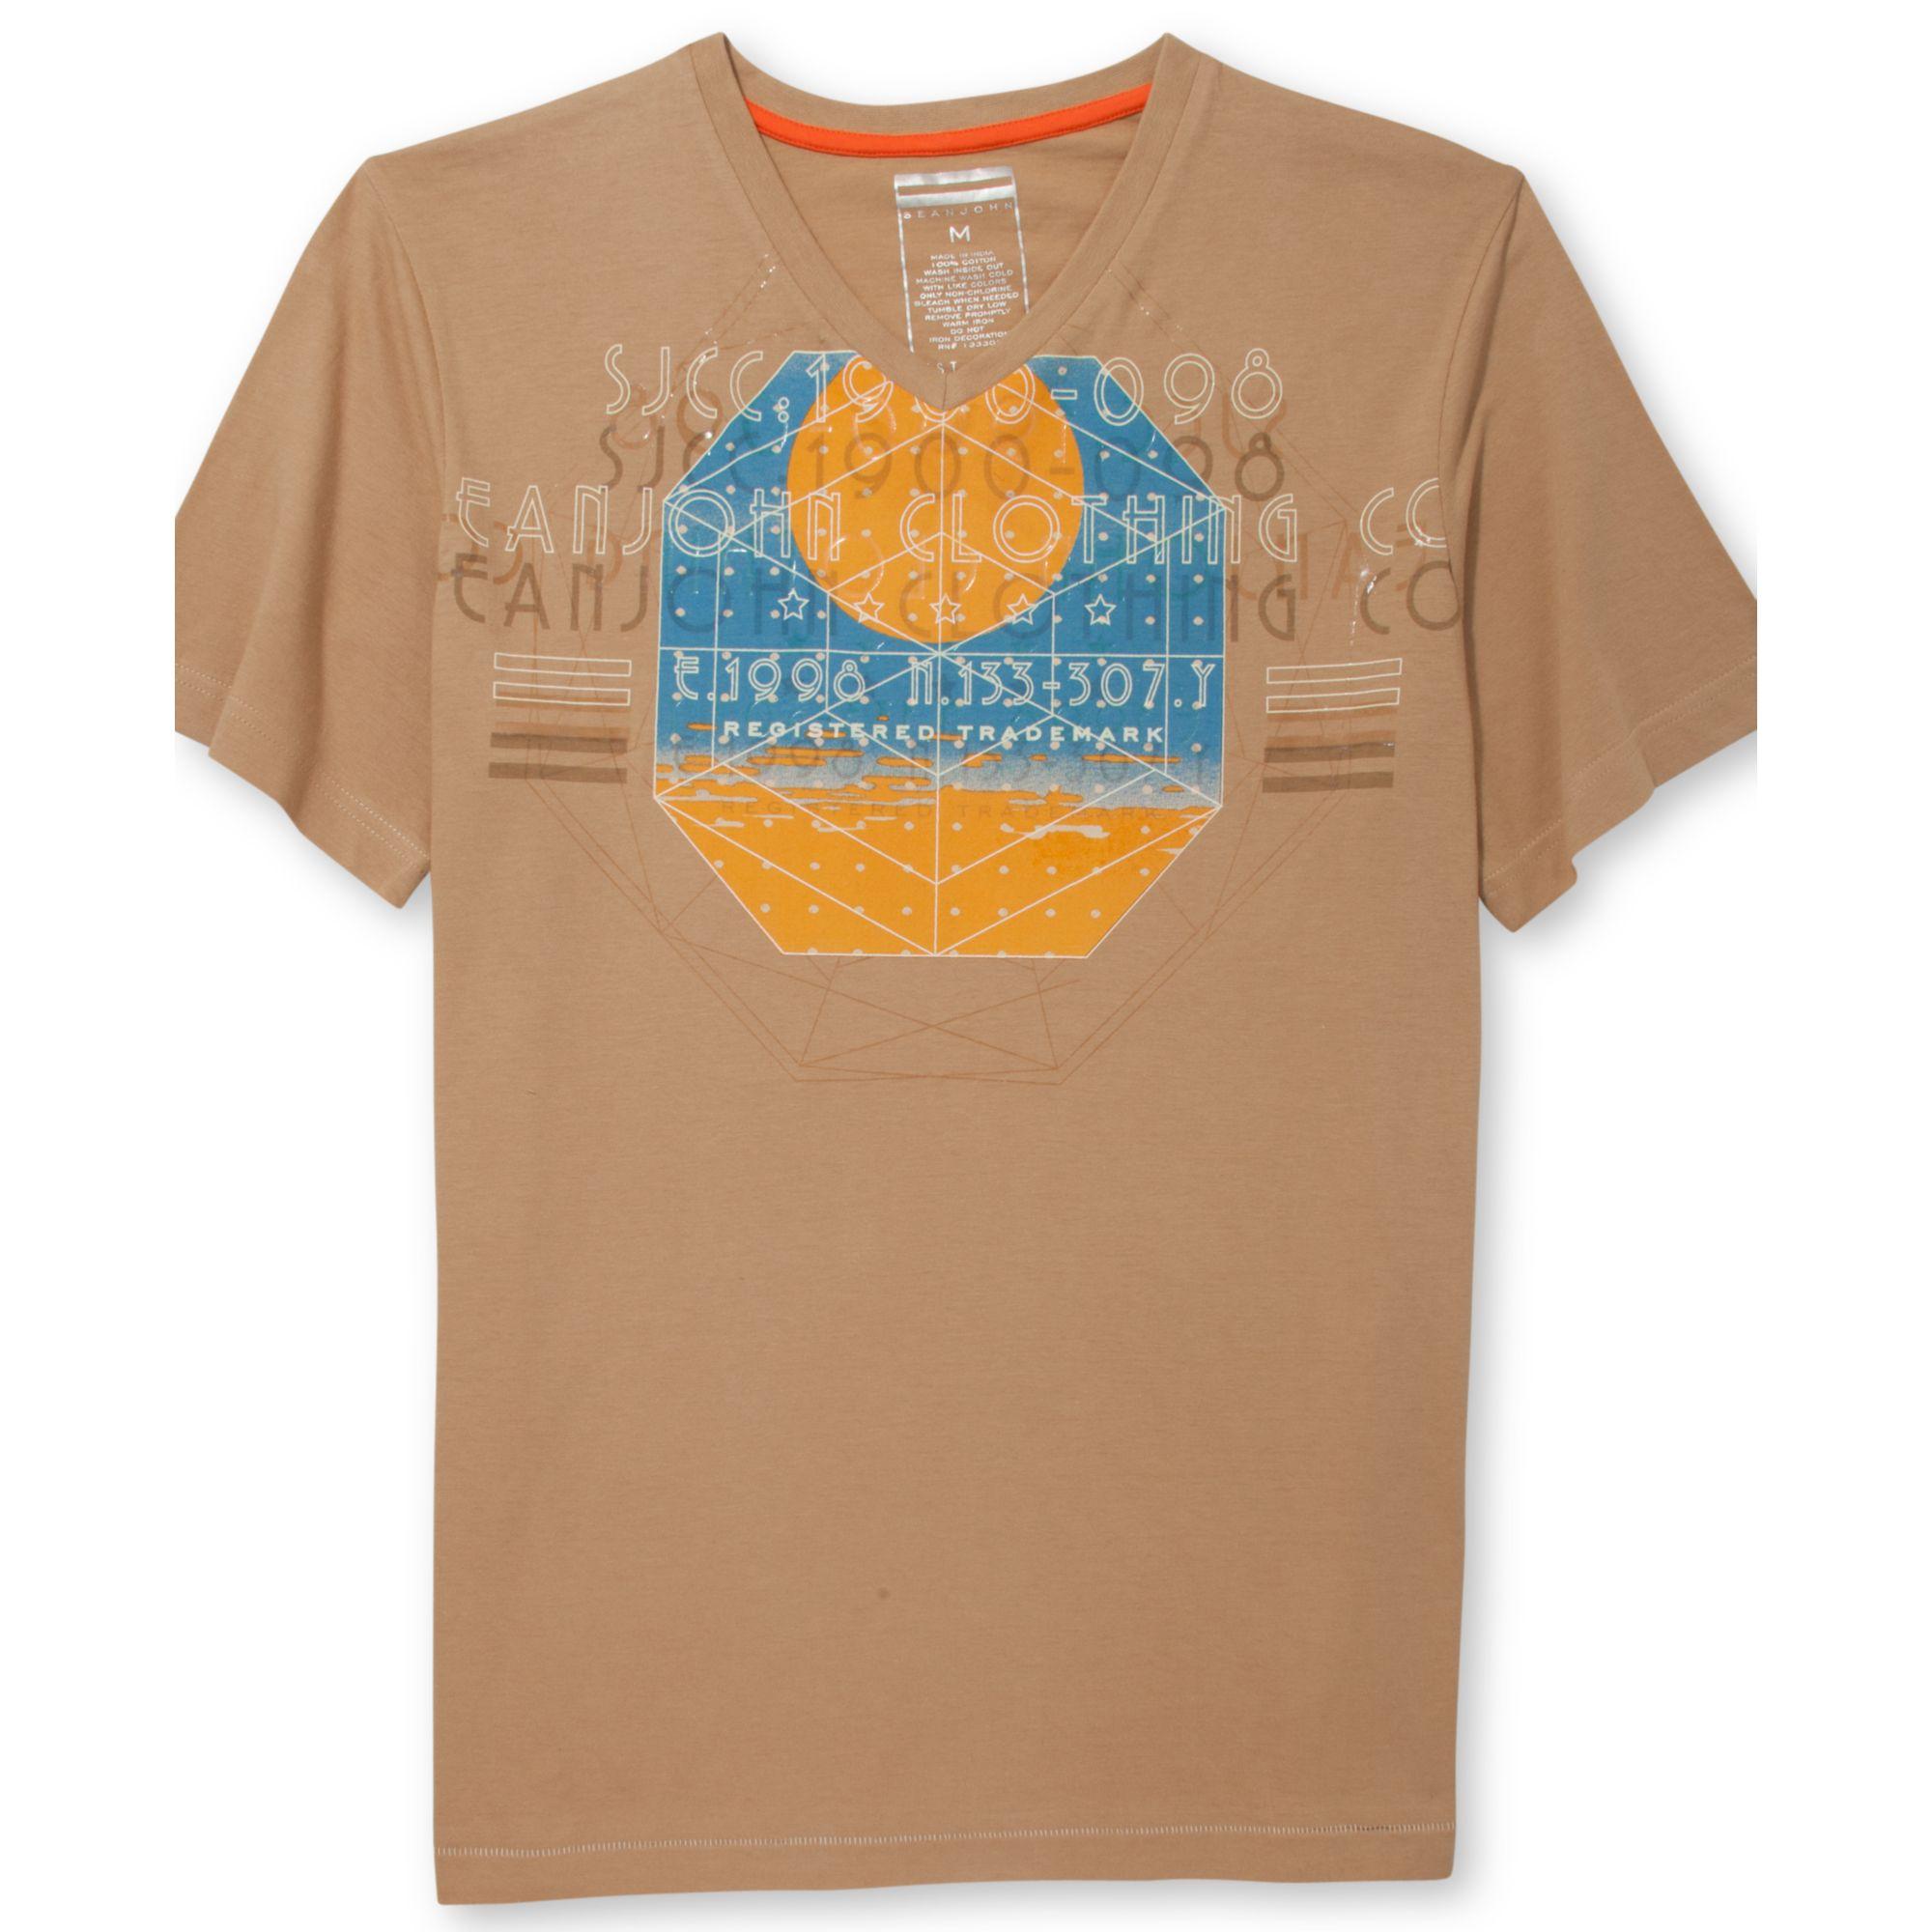 Sean John Sunscreen Tshirt In Brown For Men Silt Lyst